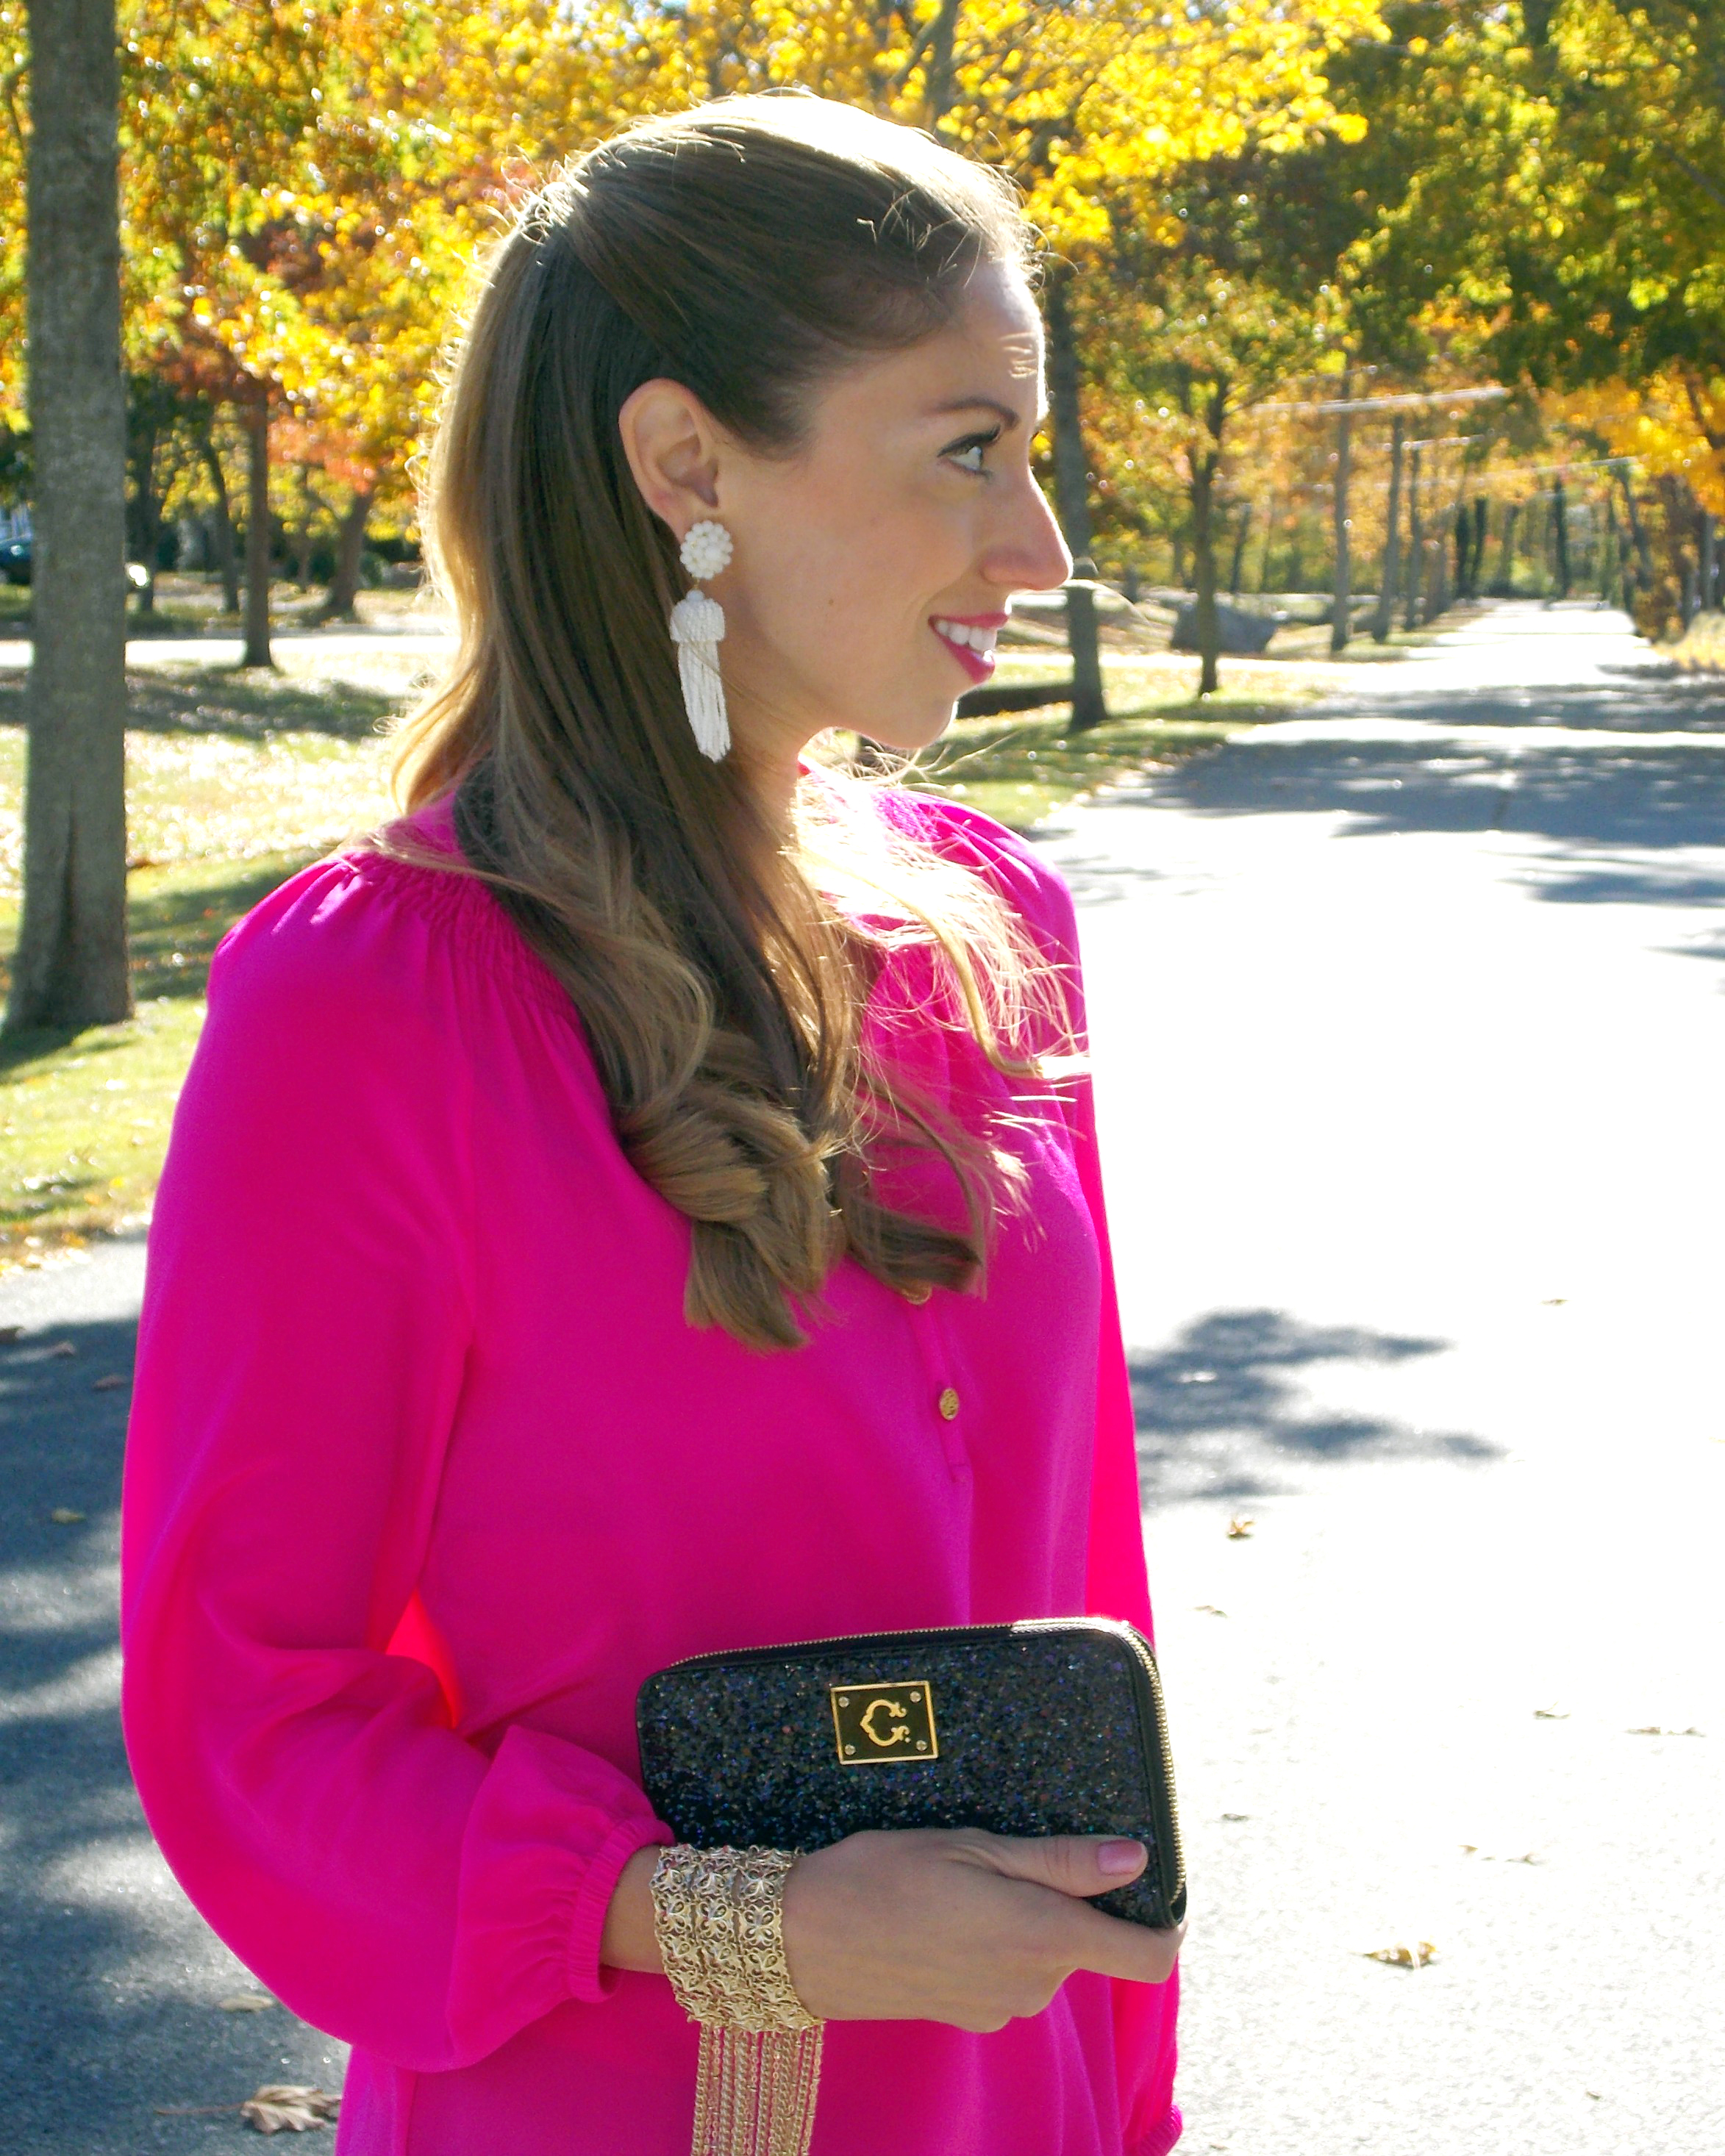 Hot Pink Elsa, Lilly Pulitzer, Lisi Lerch Tassel Earrings, Kate Spade  Glitter Shoes